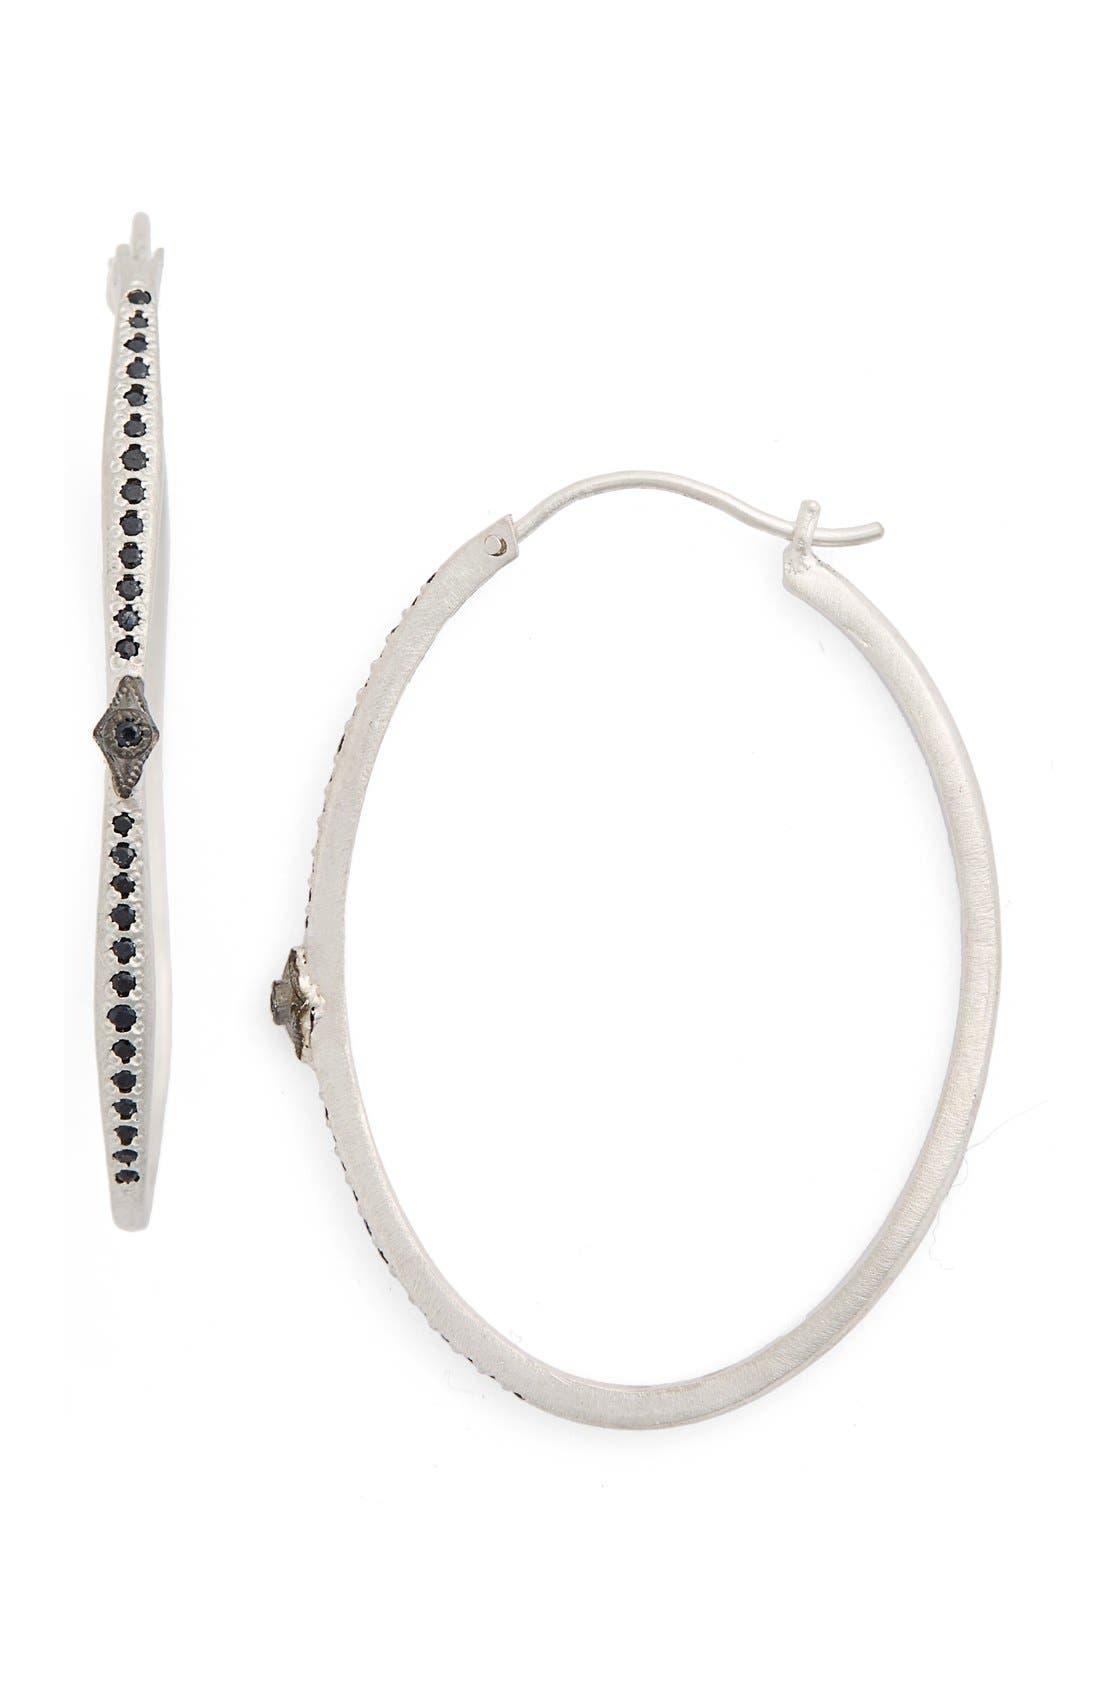 New World Black Sapphire Hoop Earrings,                         Main,                         color, Silver